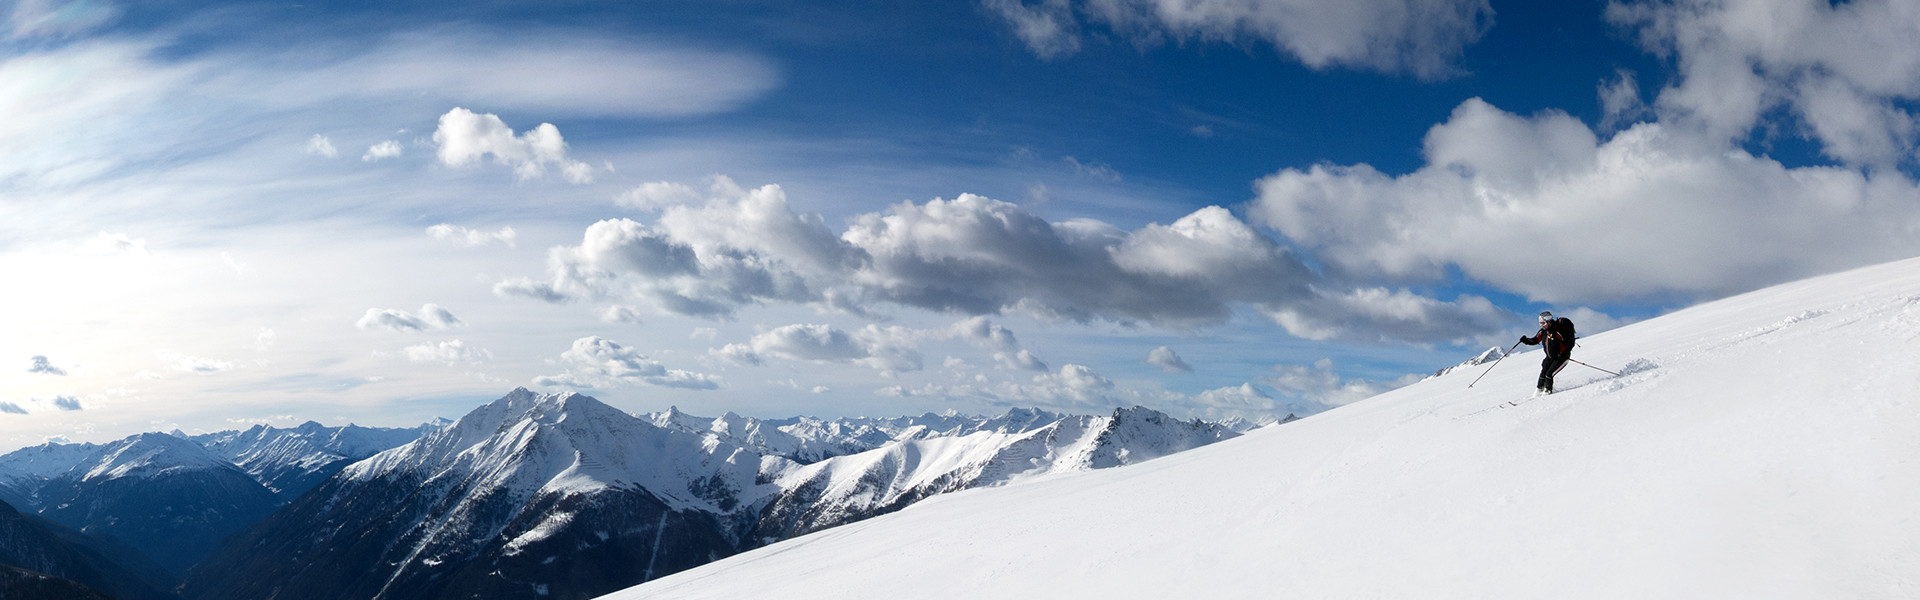 Skitourenperlen der Alpen